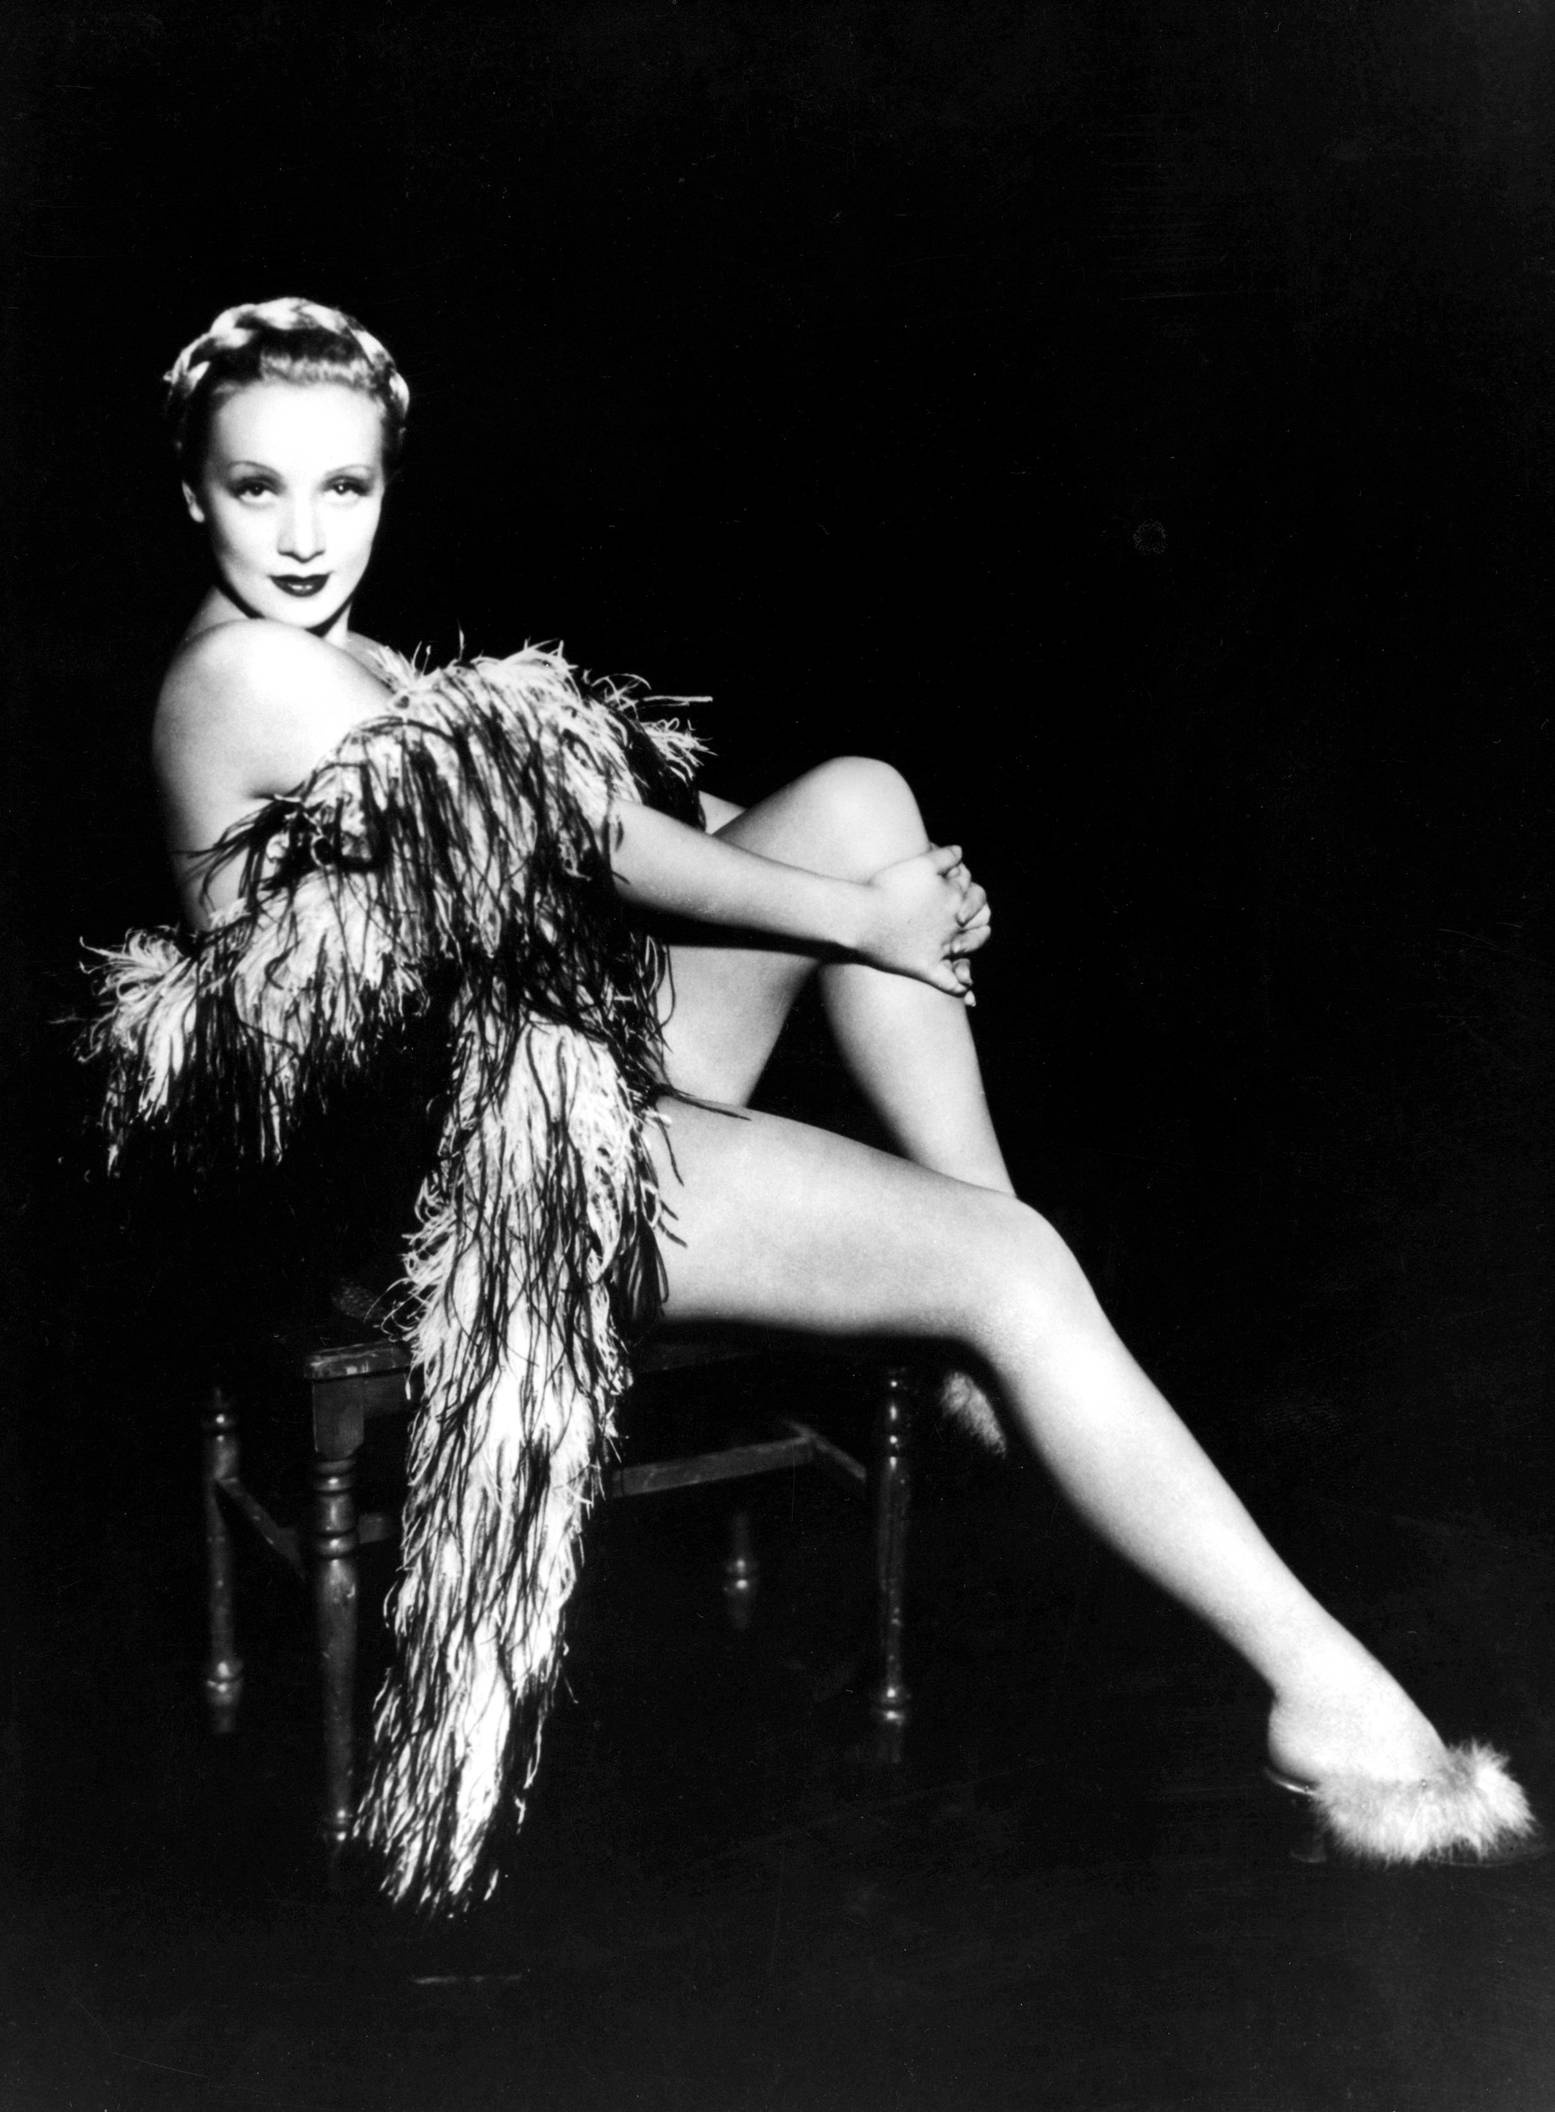 Marlene Dietrich - Marlene Dietrich Photo (23183446) - Fanpop